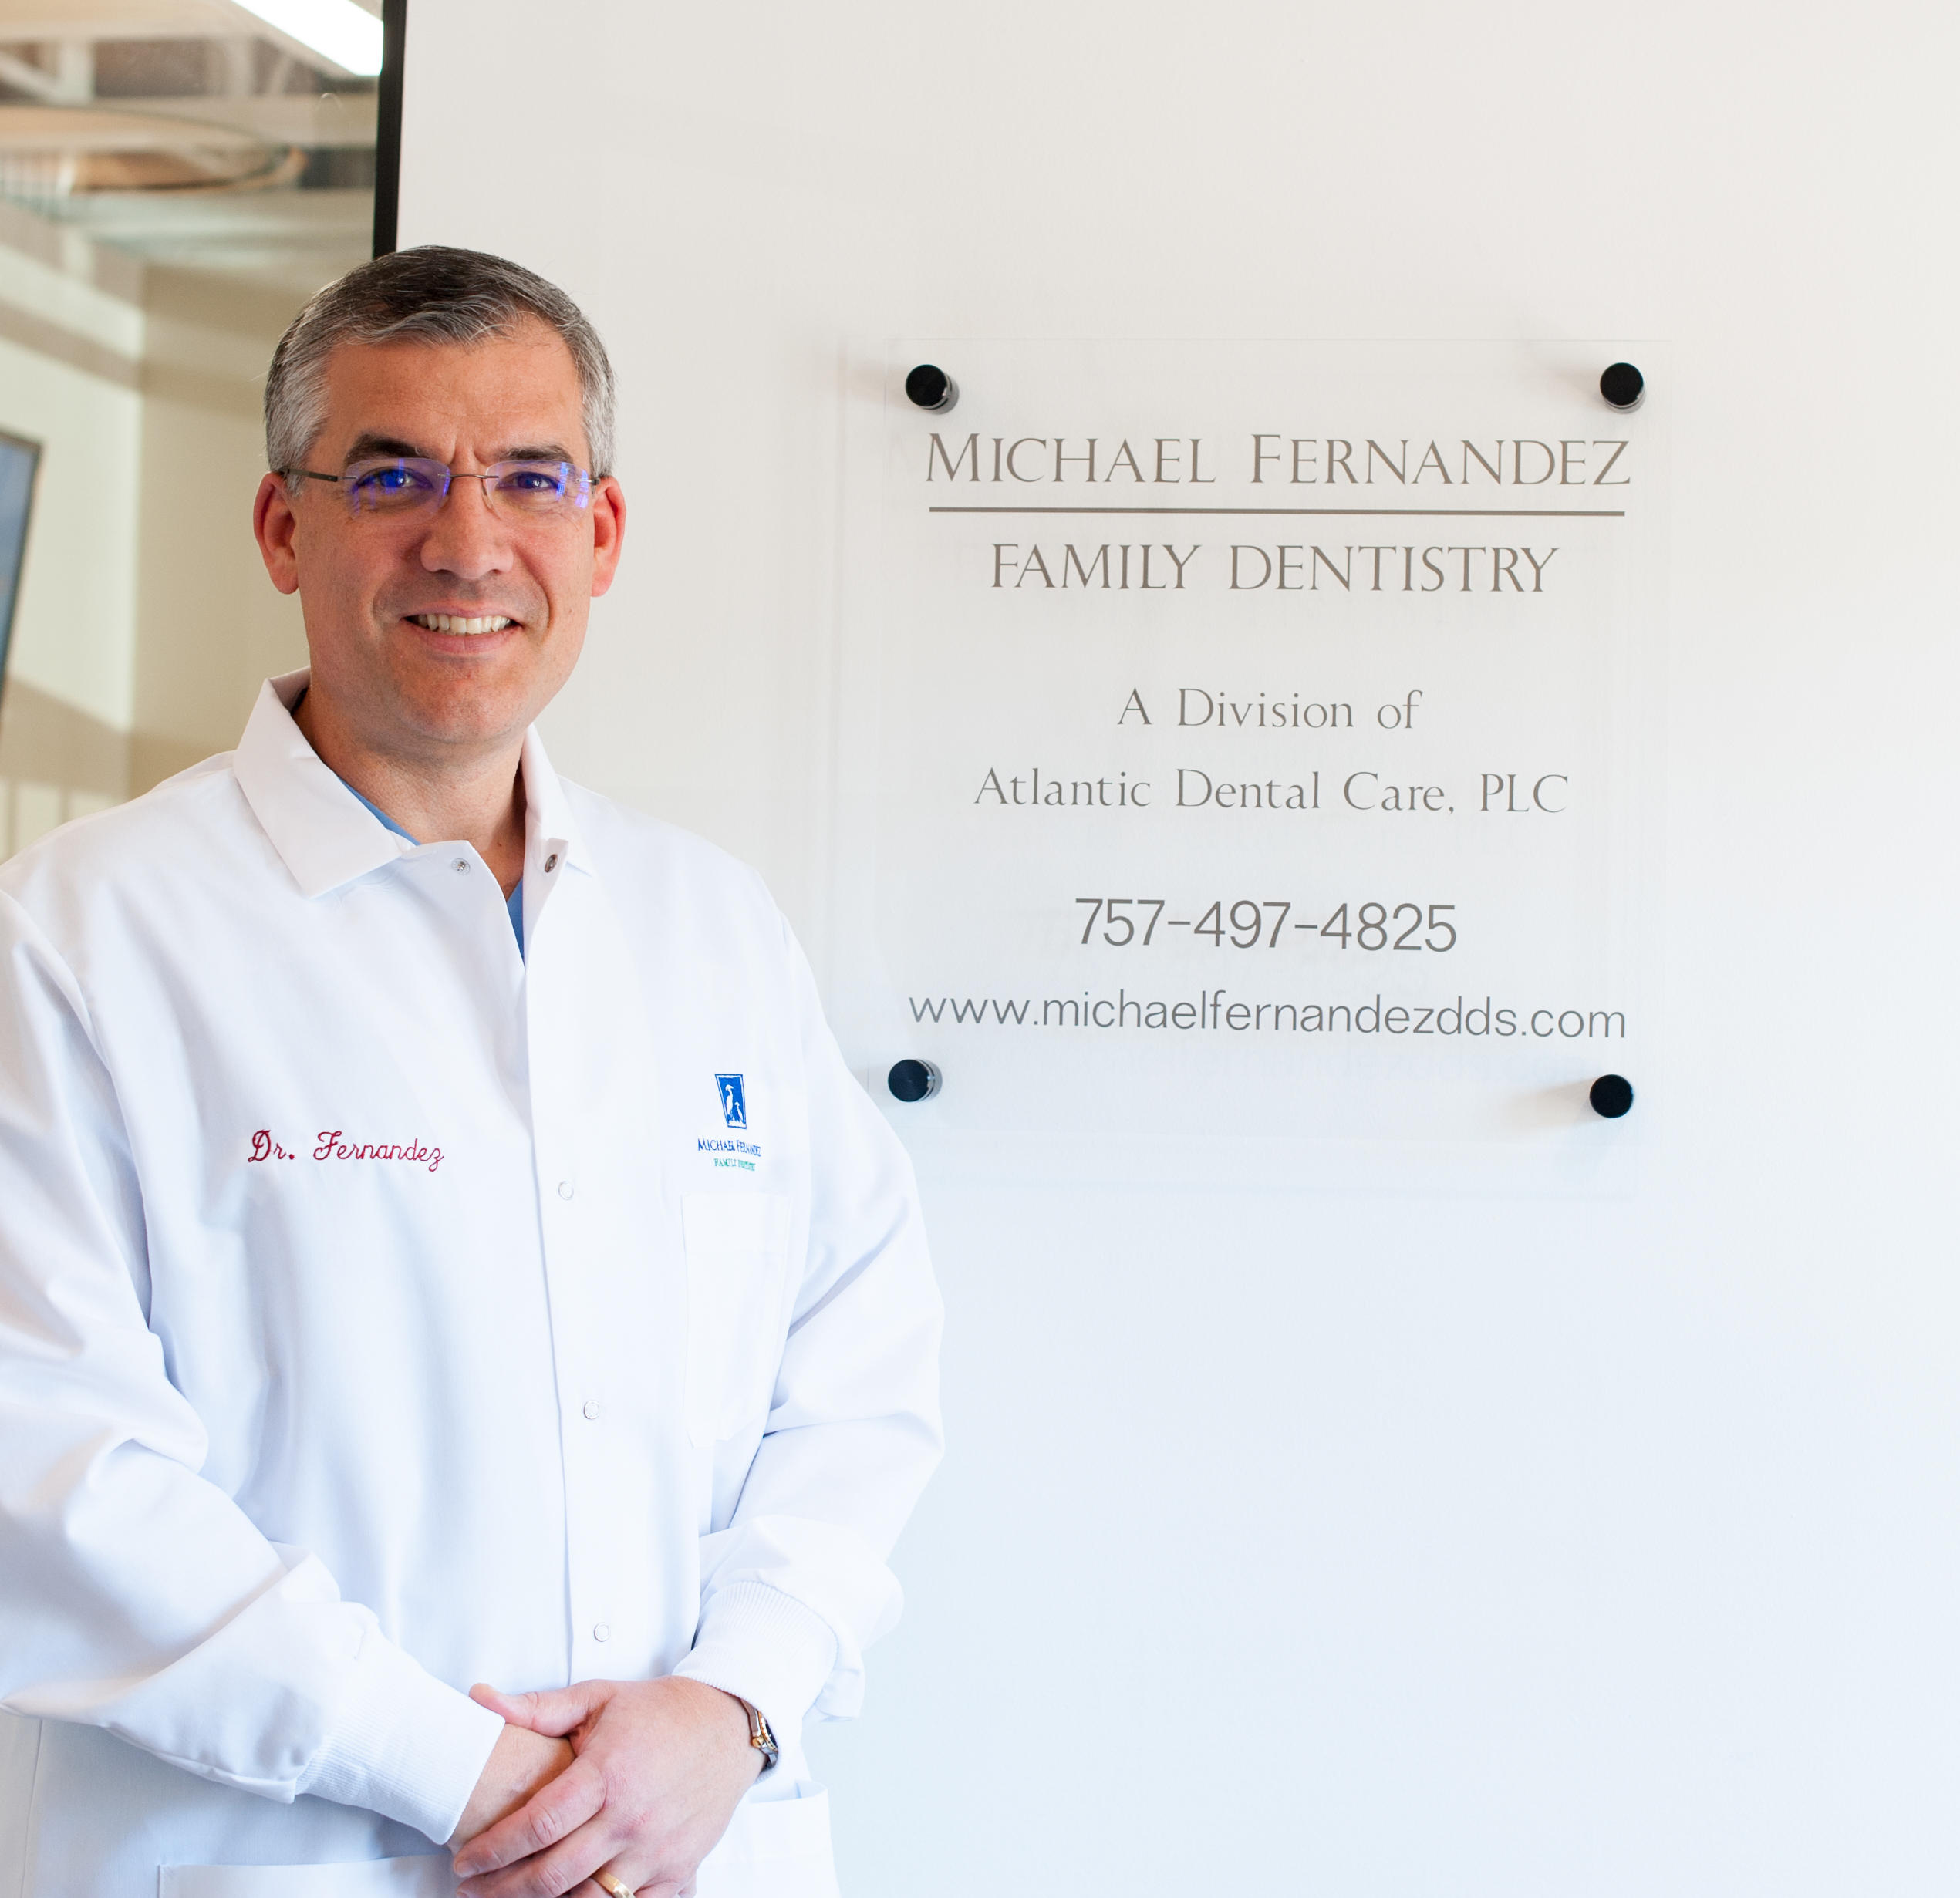 Michael Fernandez Family Dentistry image 0